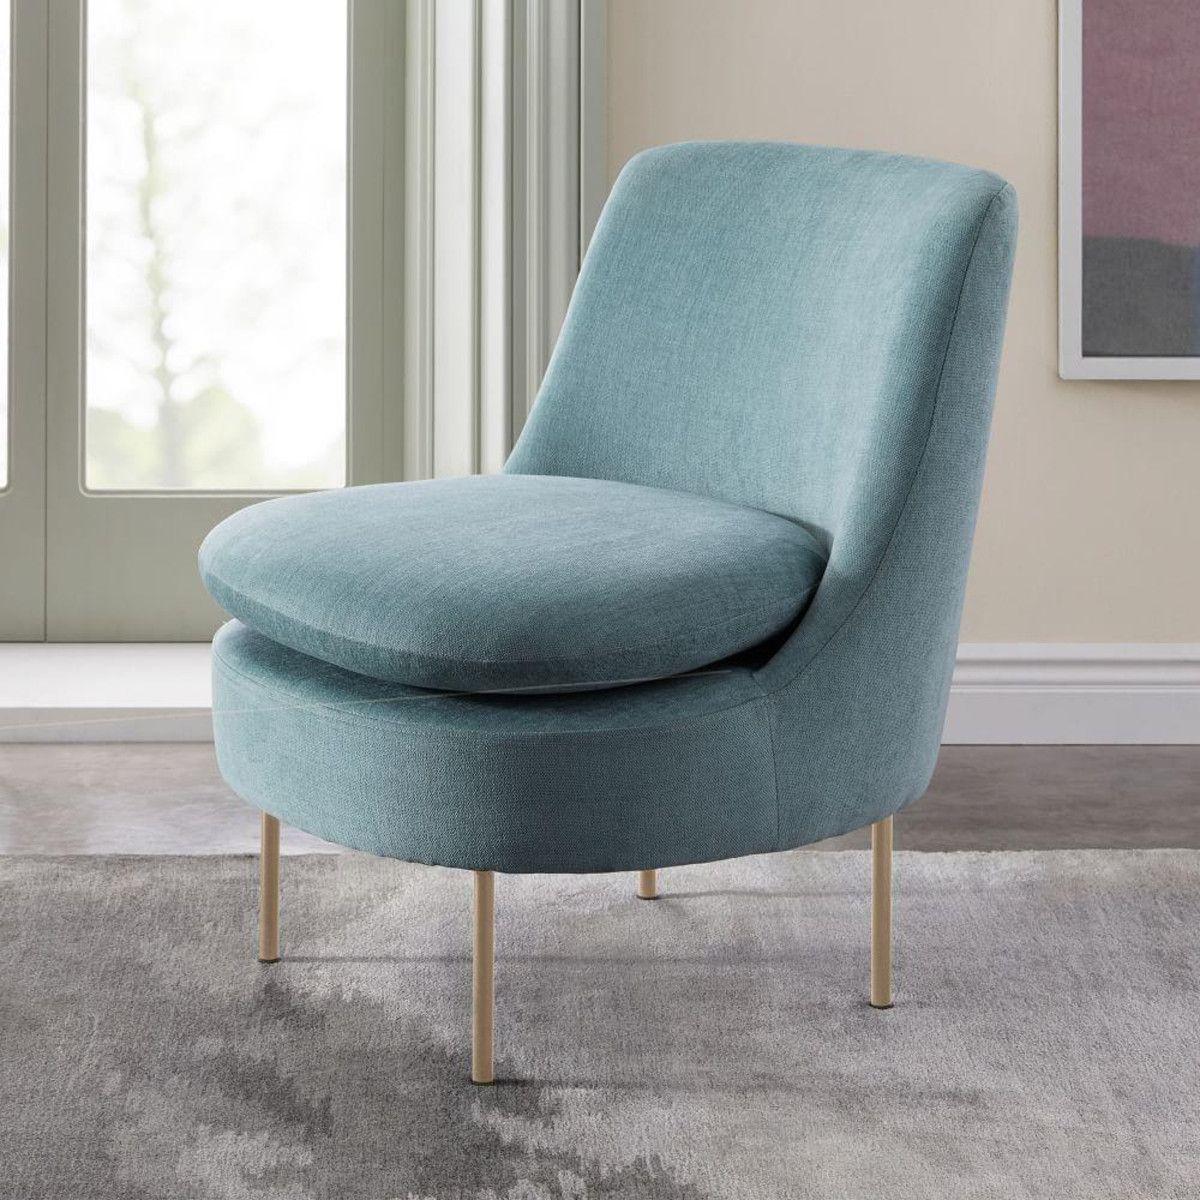 Modern Curved Velvet Slipper Chair  west elm AU  Vintage dining